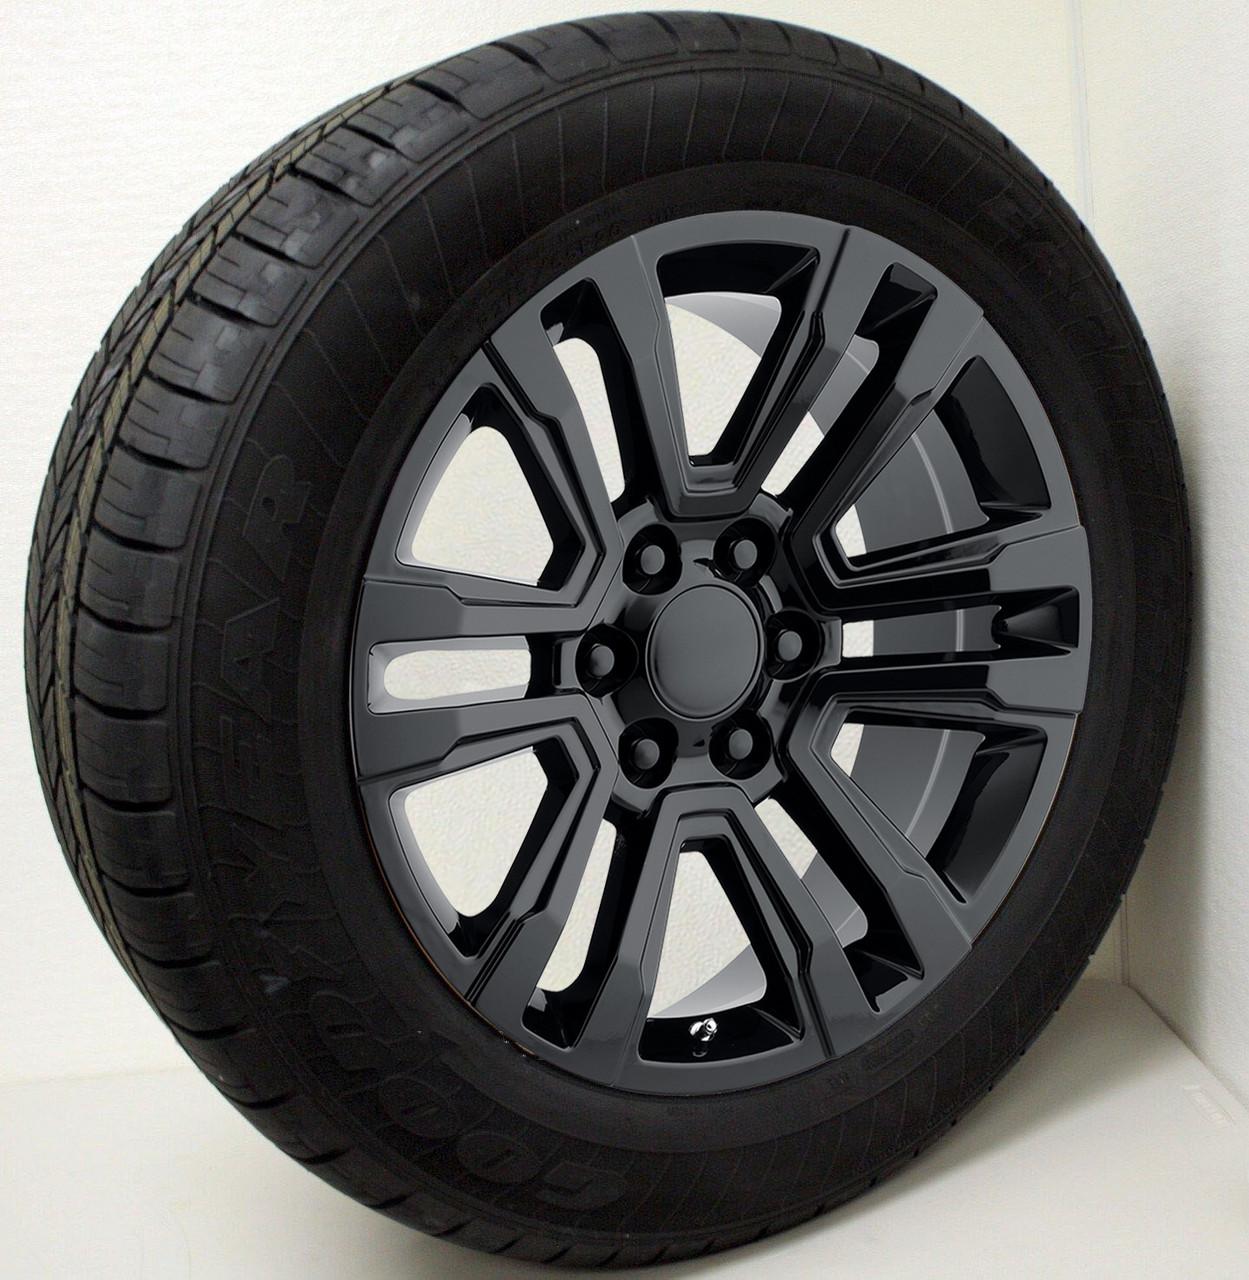 "Gloss Black 20"" Denali Style Split Spoke Wheels with Goodyear Tires for GMC Sierra, Yukon, Denali - New Set of 4"